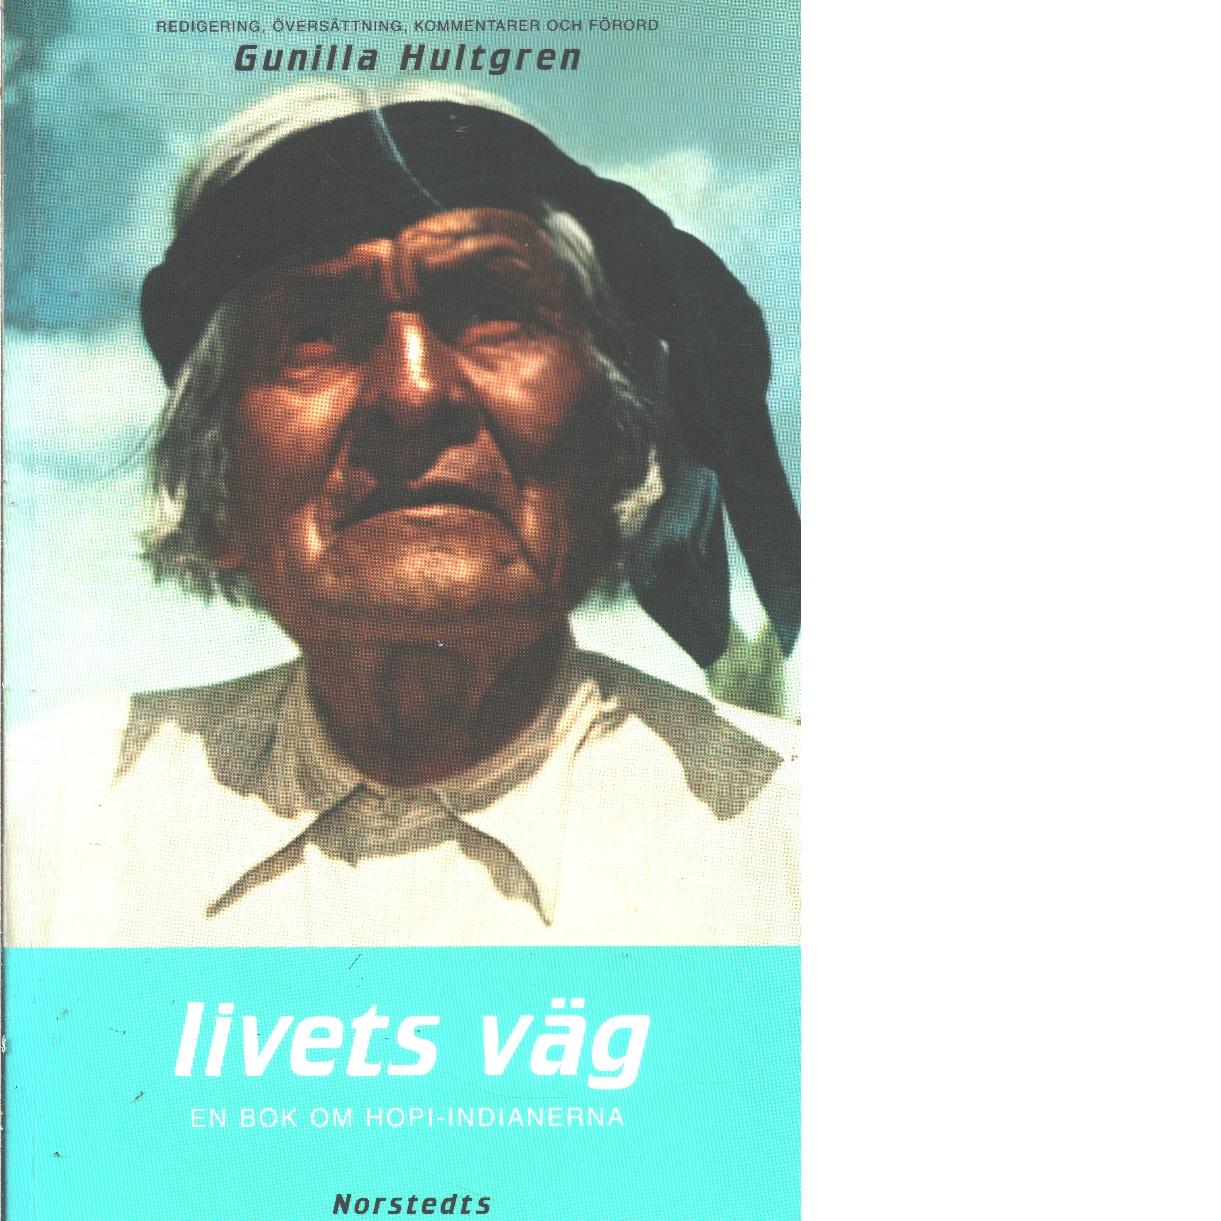 Livets väg : en bok om hopi-indianerna - Red.